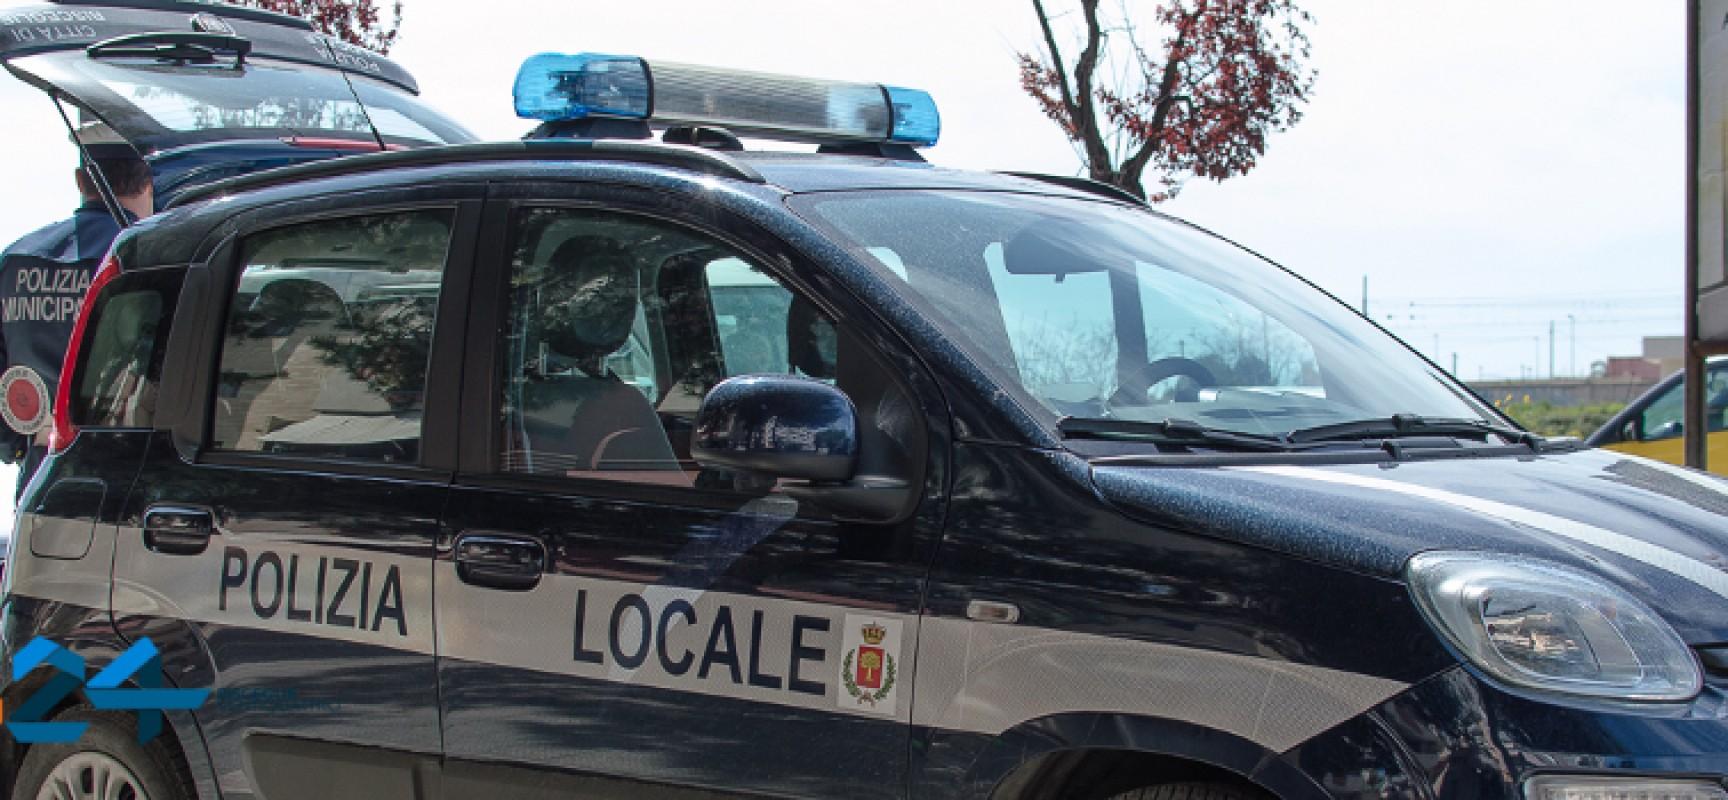 La solidarietà di Unimpresa Bat e Mercatincittà alla Polizia Municipale di Bisceglie